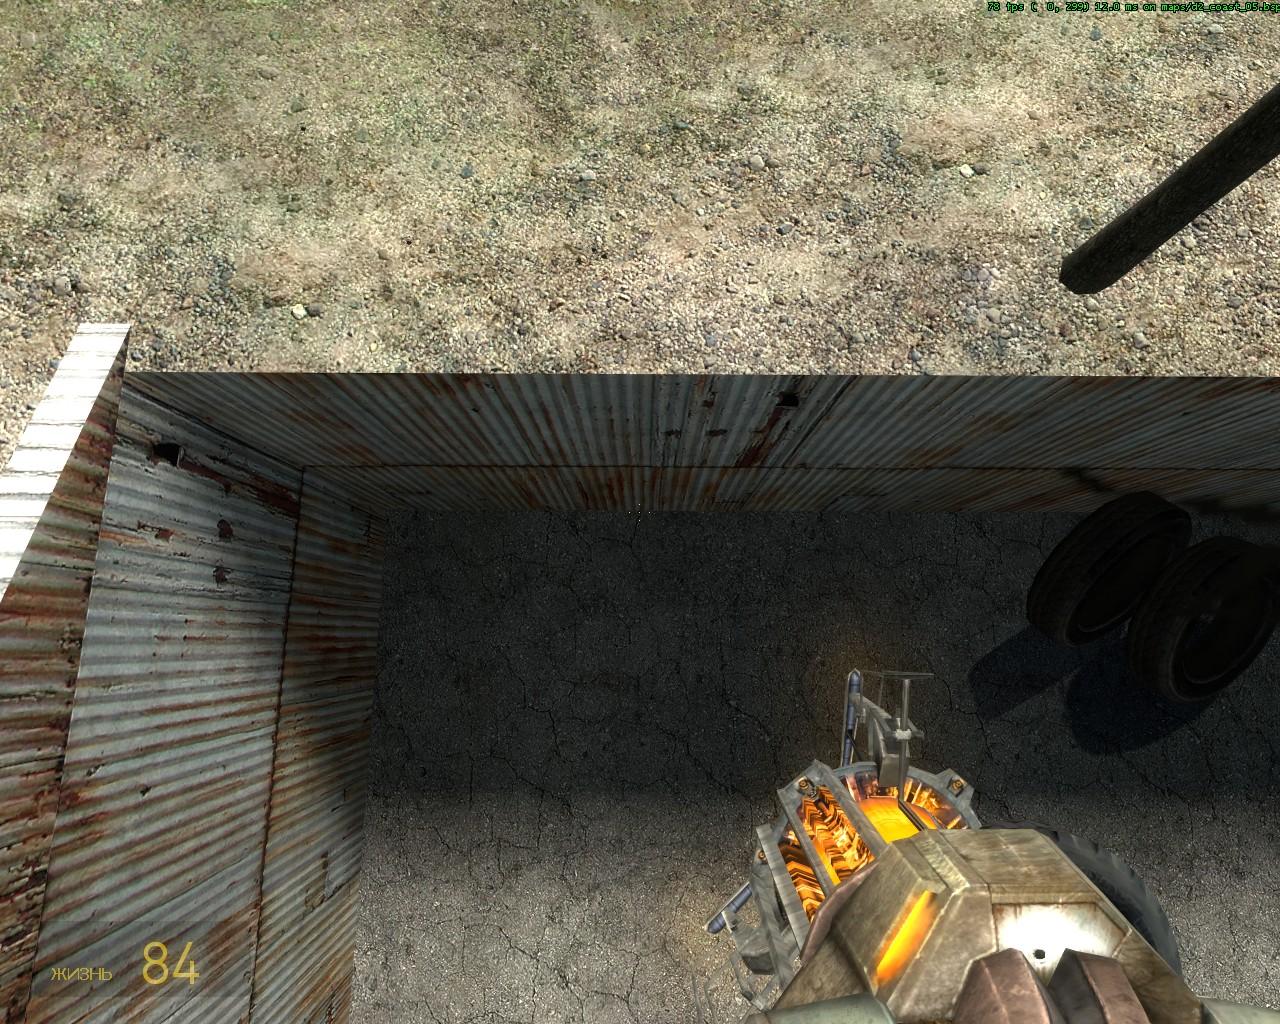 d2_coast_050004.jpg - Half-Life 2